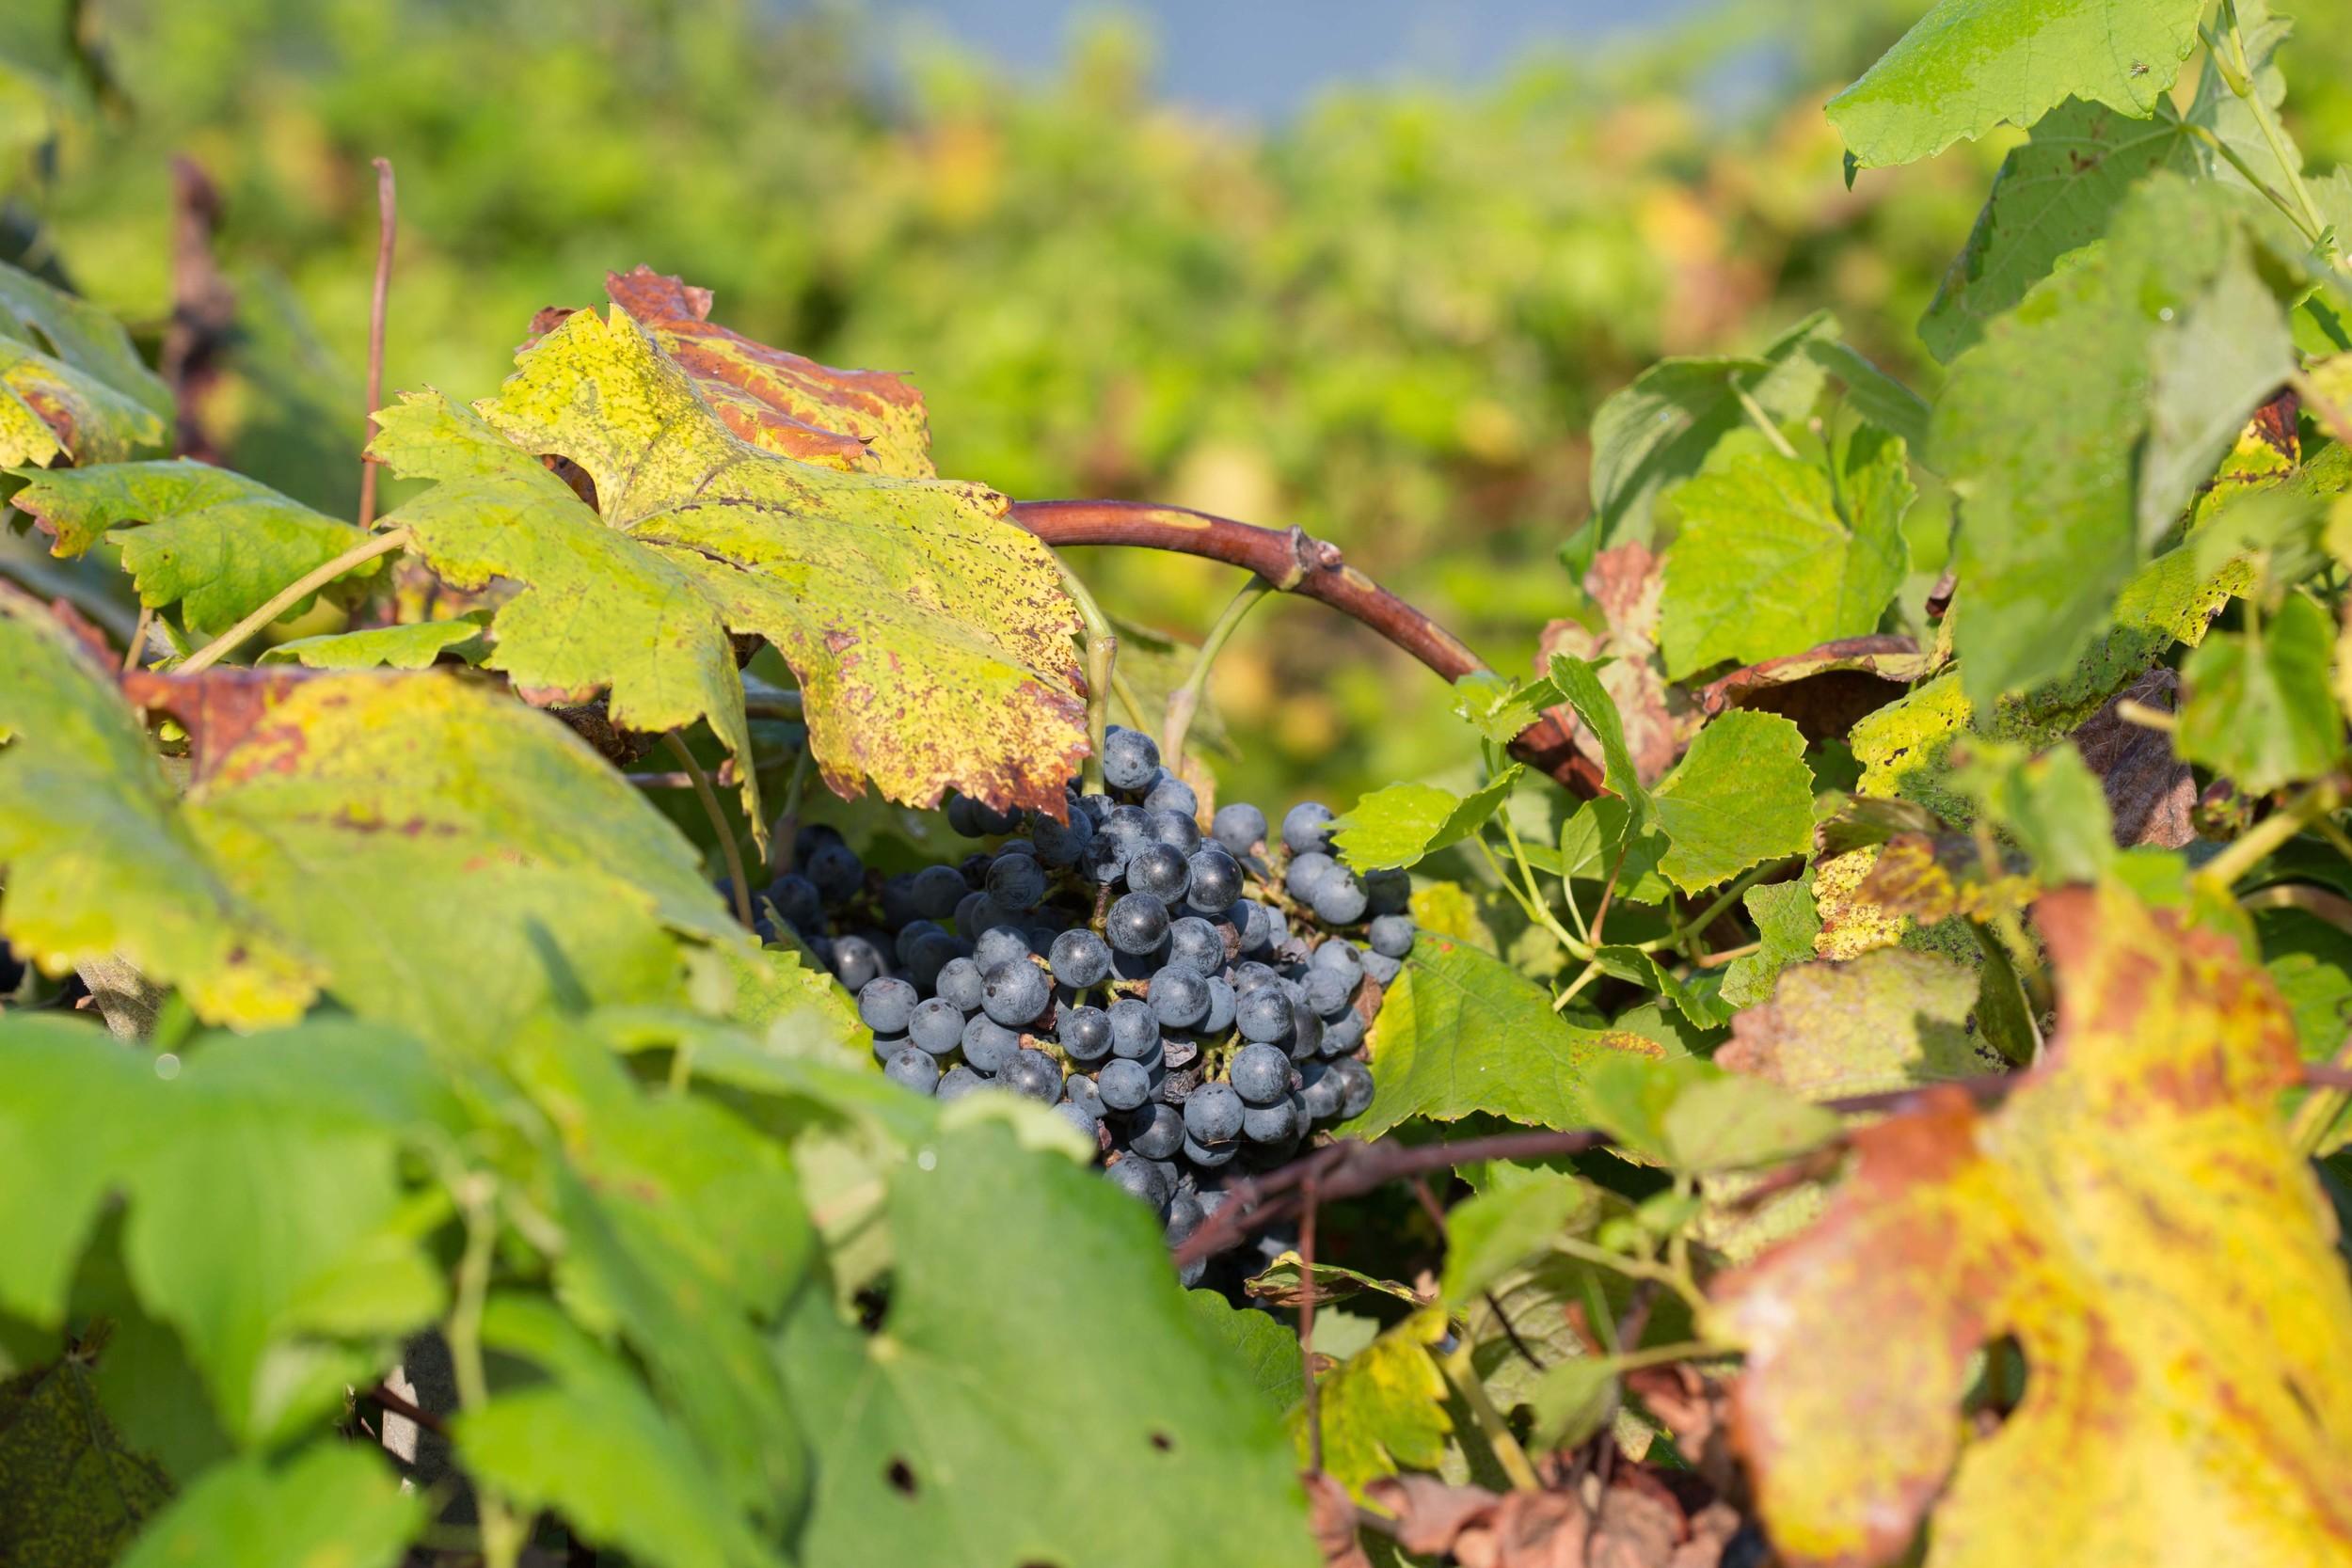 hidden_grapes_kiepersol.jpg